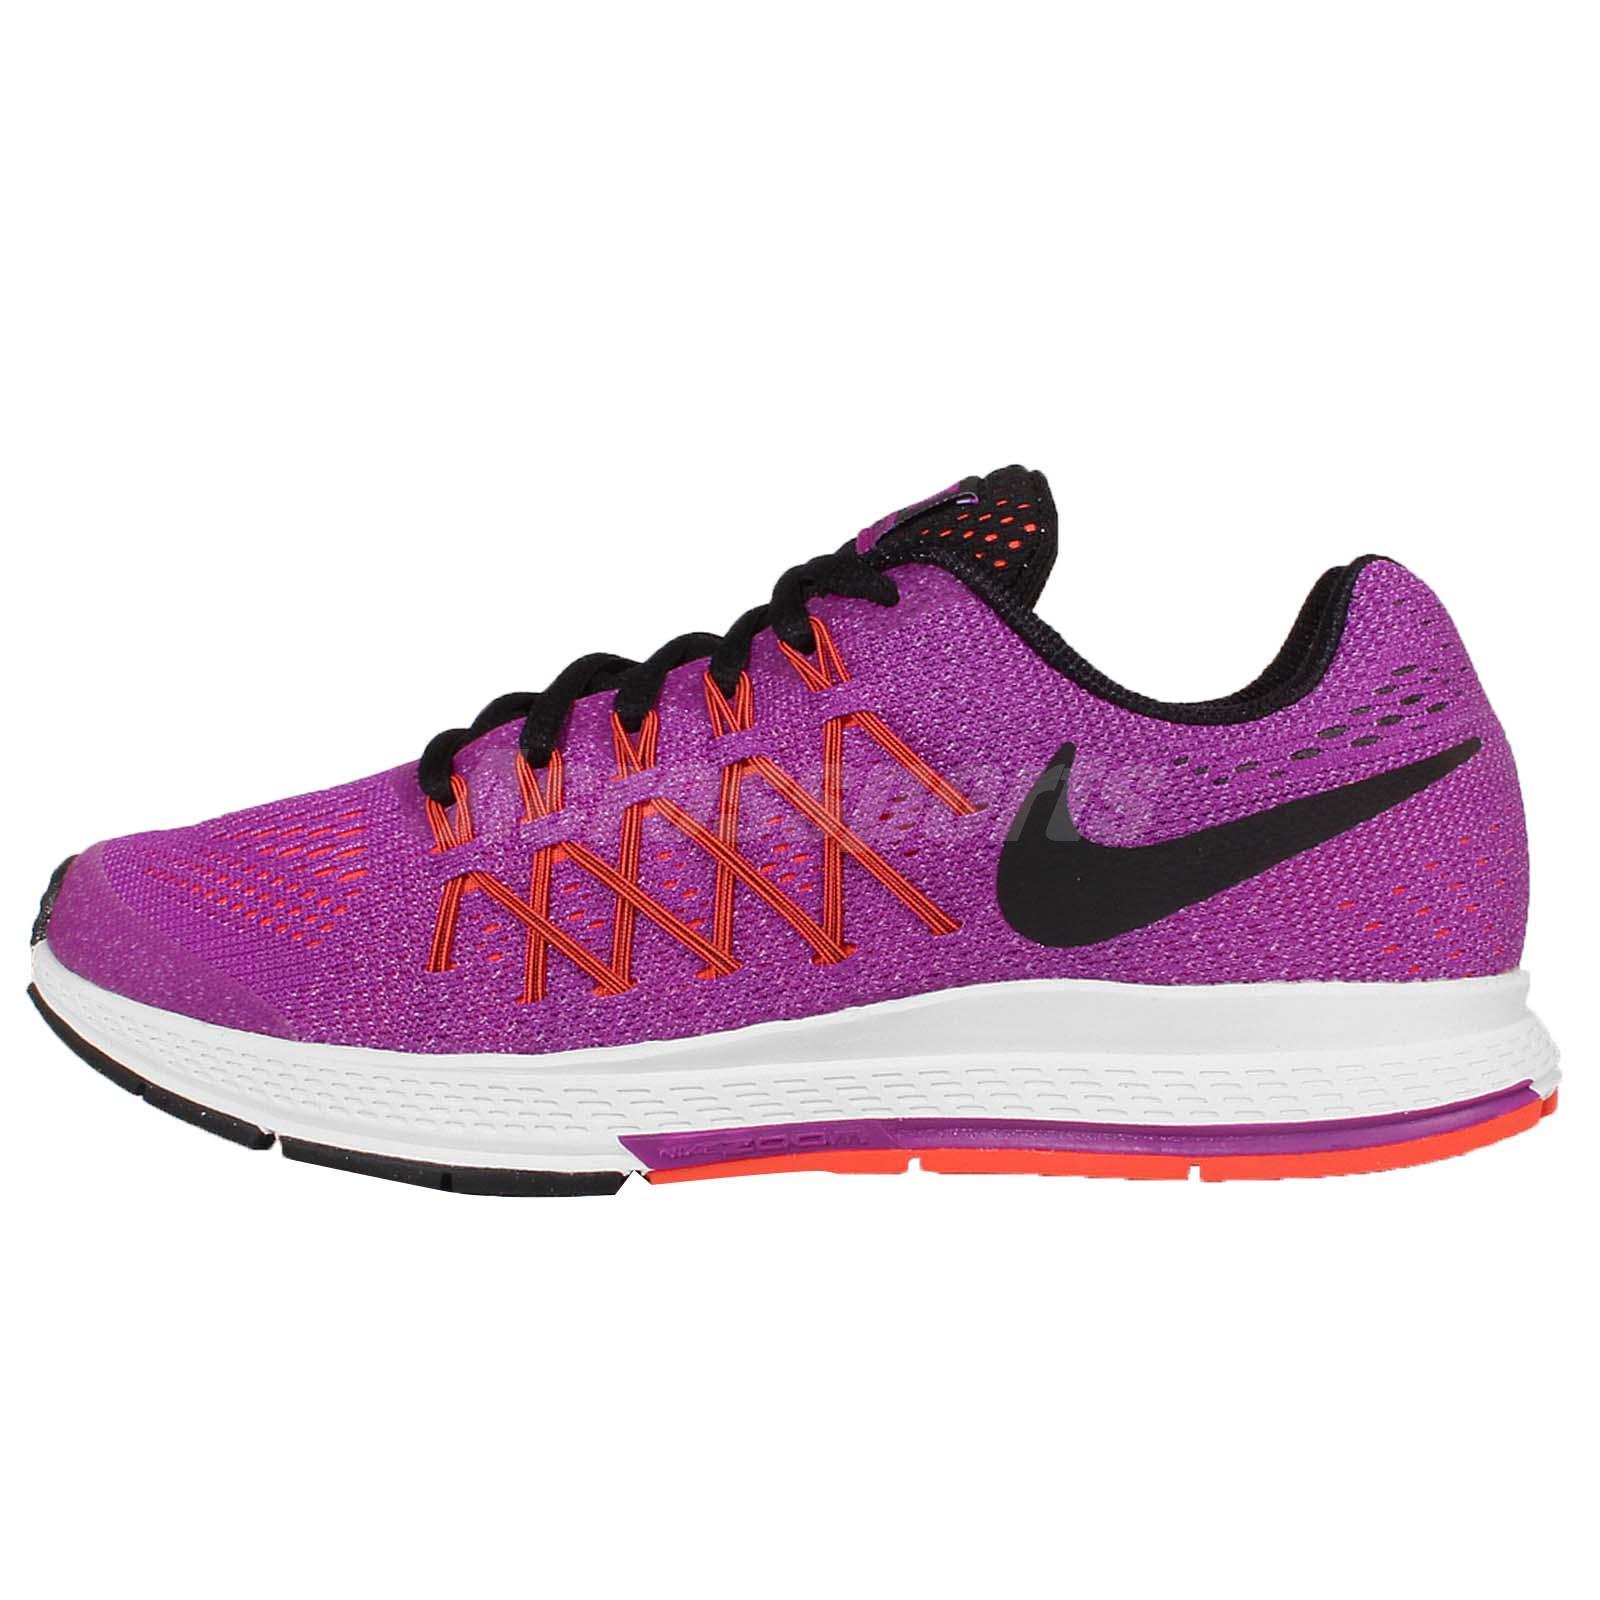 huge discount 41194 d0821 ... Nike Zoom Pegasus 32 GS Purple Black Kids Youth Womens Running Shoes  759972-500 ...